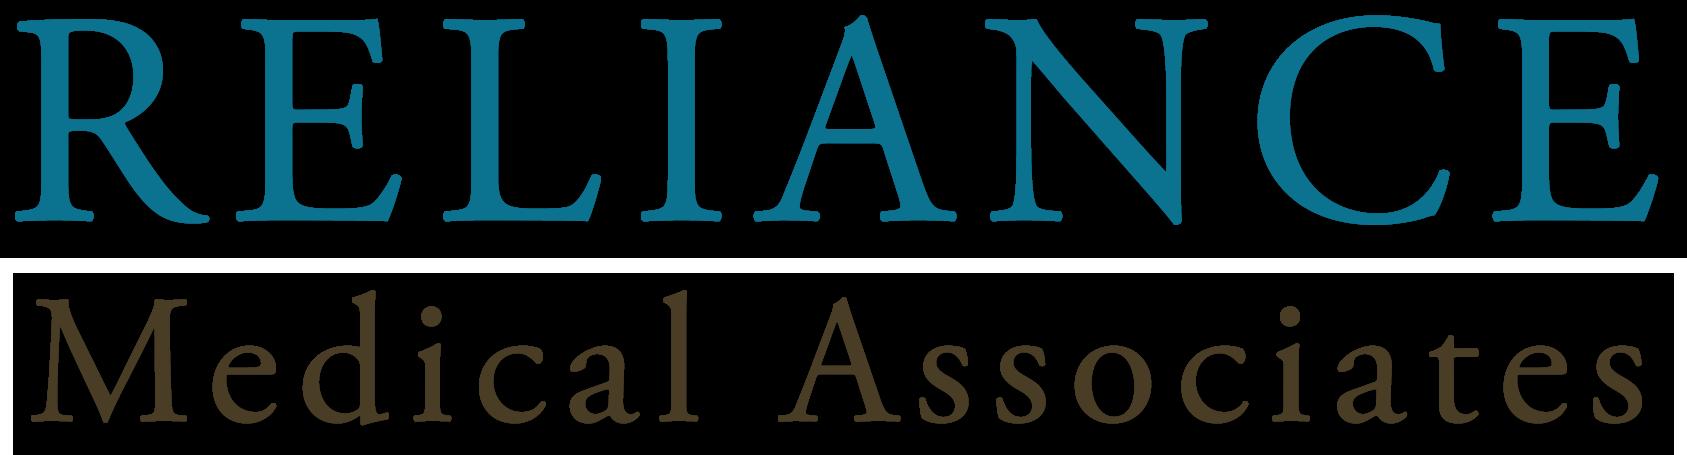 Reliance Medical Associates